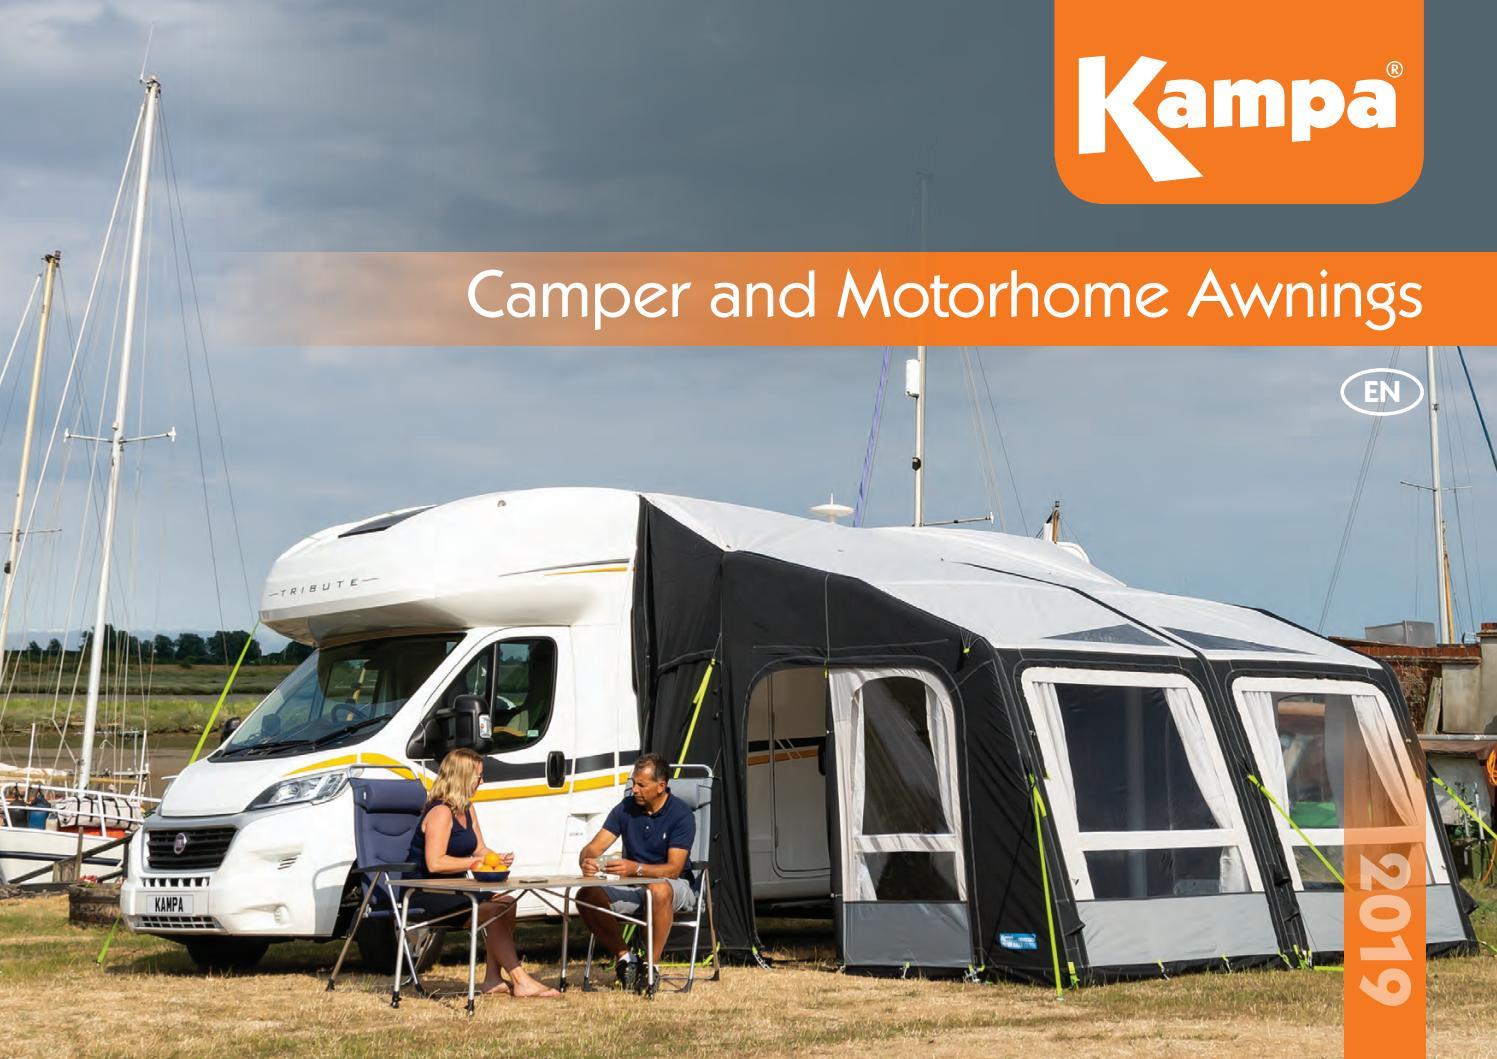 Kampa Ace 400 Caravan Awning Easy Tread Groundsheet Carpet Breathable 111130